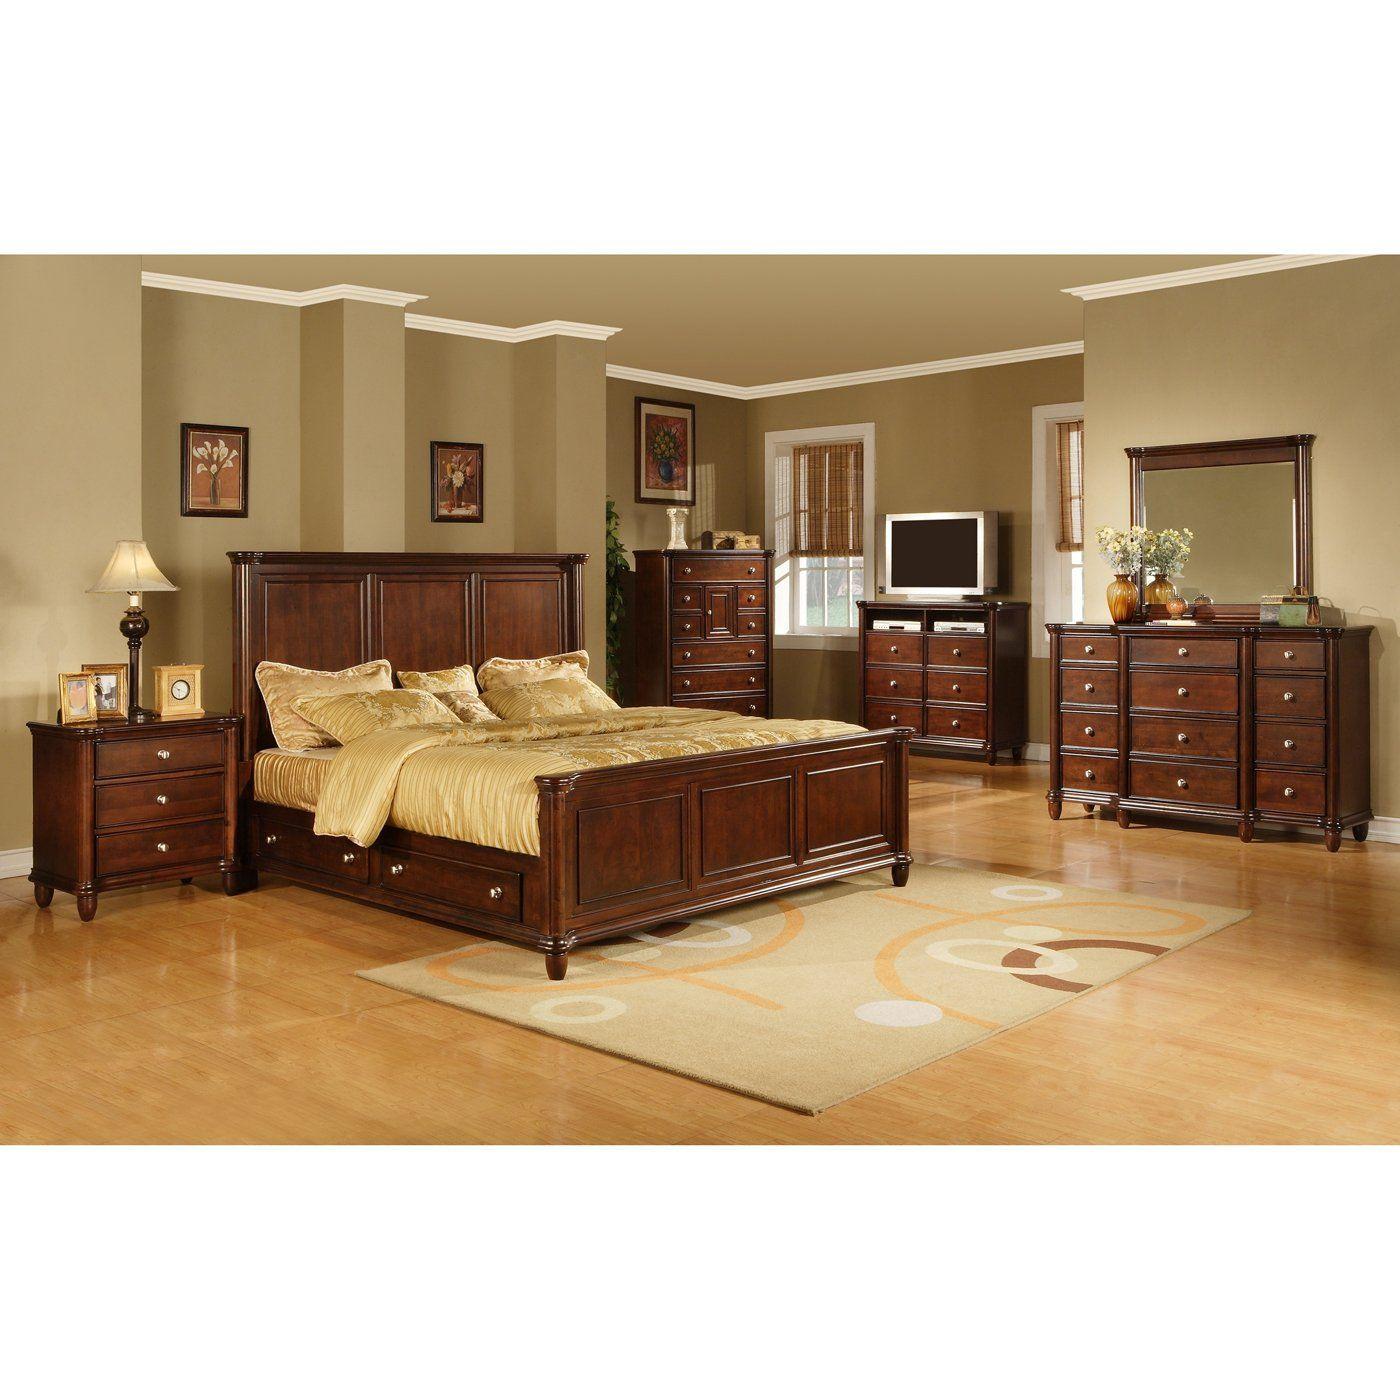 Elements International Hamilton Bedroom Set